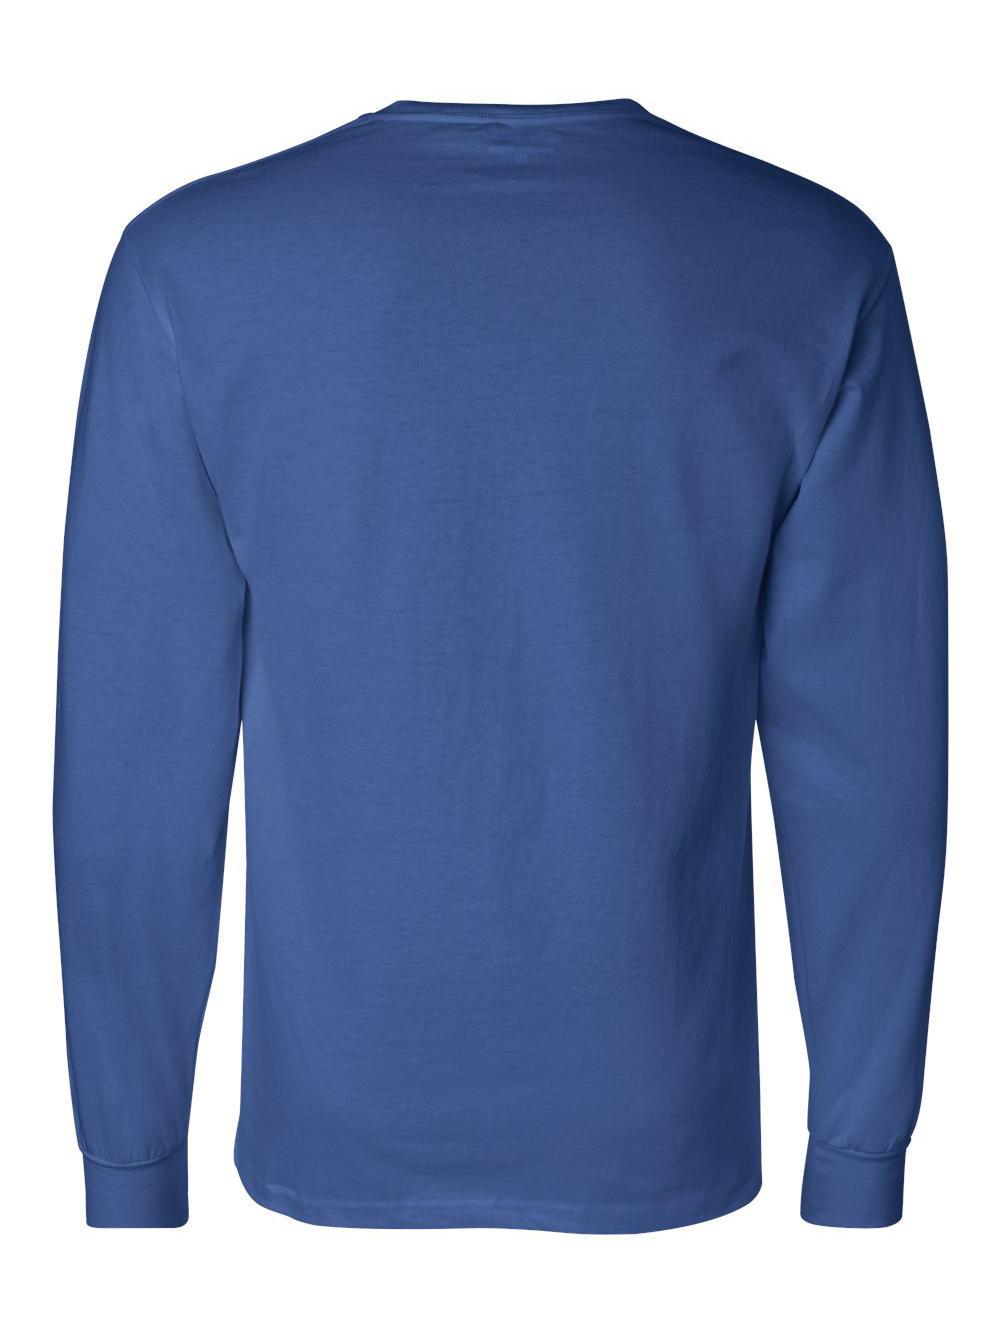 Champion-Long-Sleeve-T-Shirt-CC8C thumbnail 13